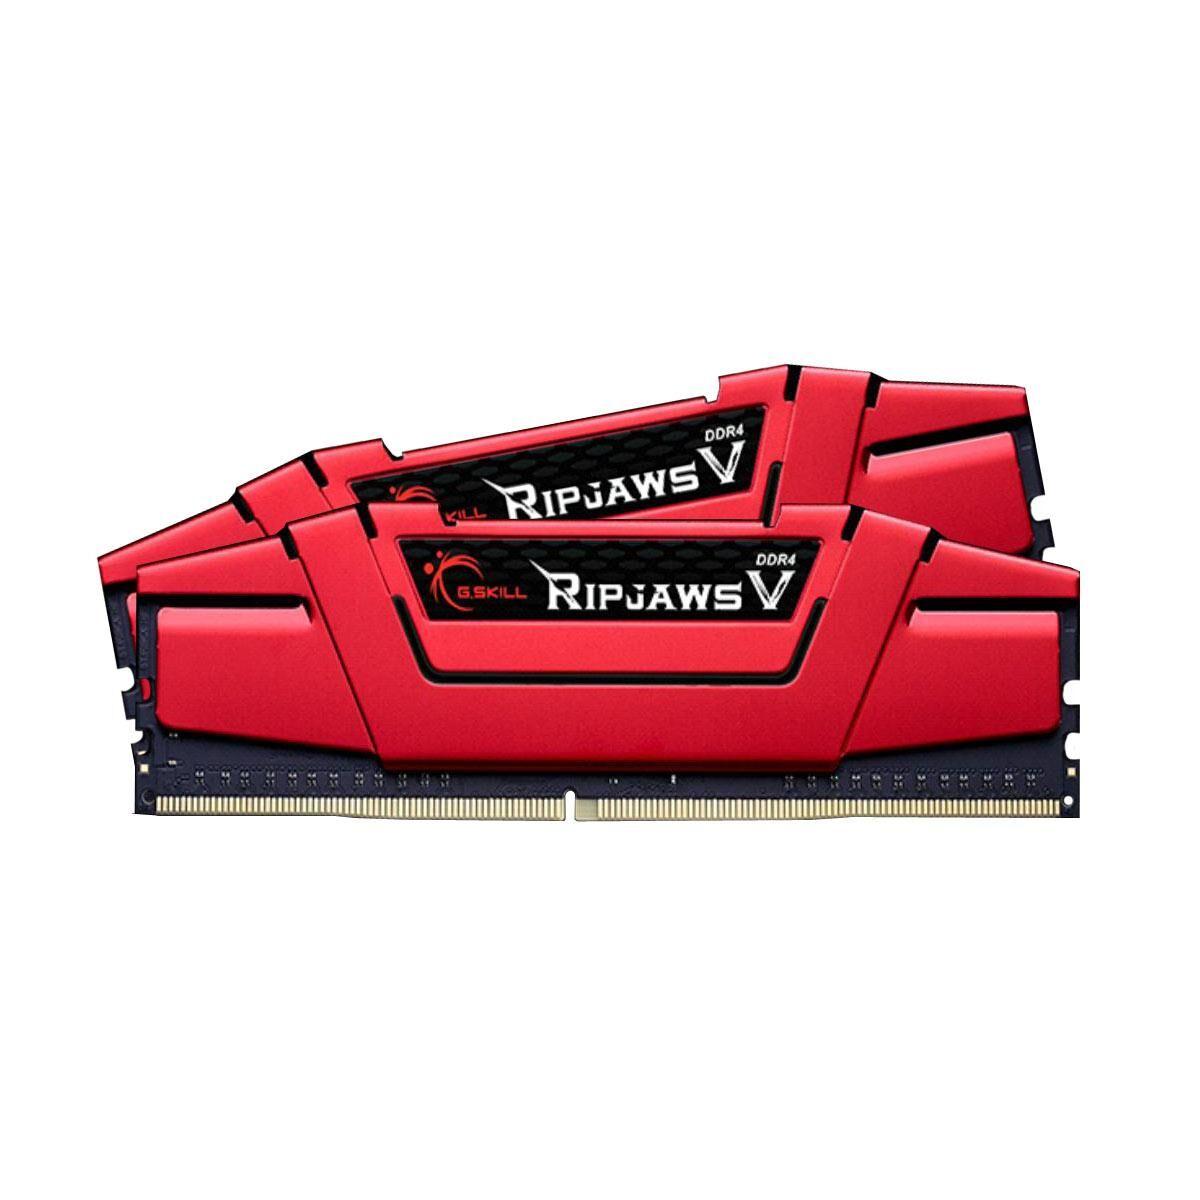 GSKILL Mémoire LONG DIMM DDR4 G.Skill DIMM 8GB DDR4-2666 Kit rouge, F4-2666C15D-8GVR, Ripjaws V 8GB CL15 15-15-35 2 barettes